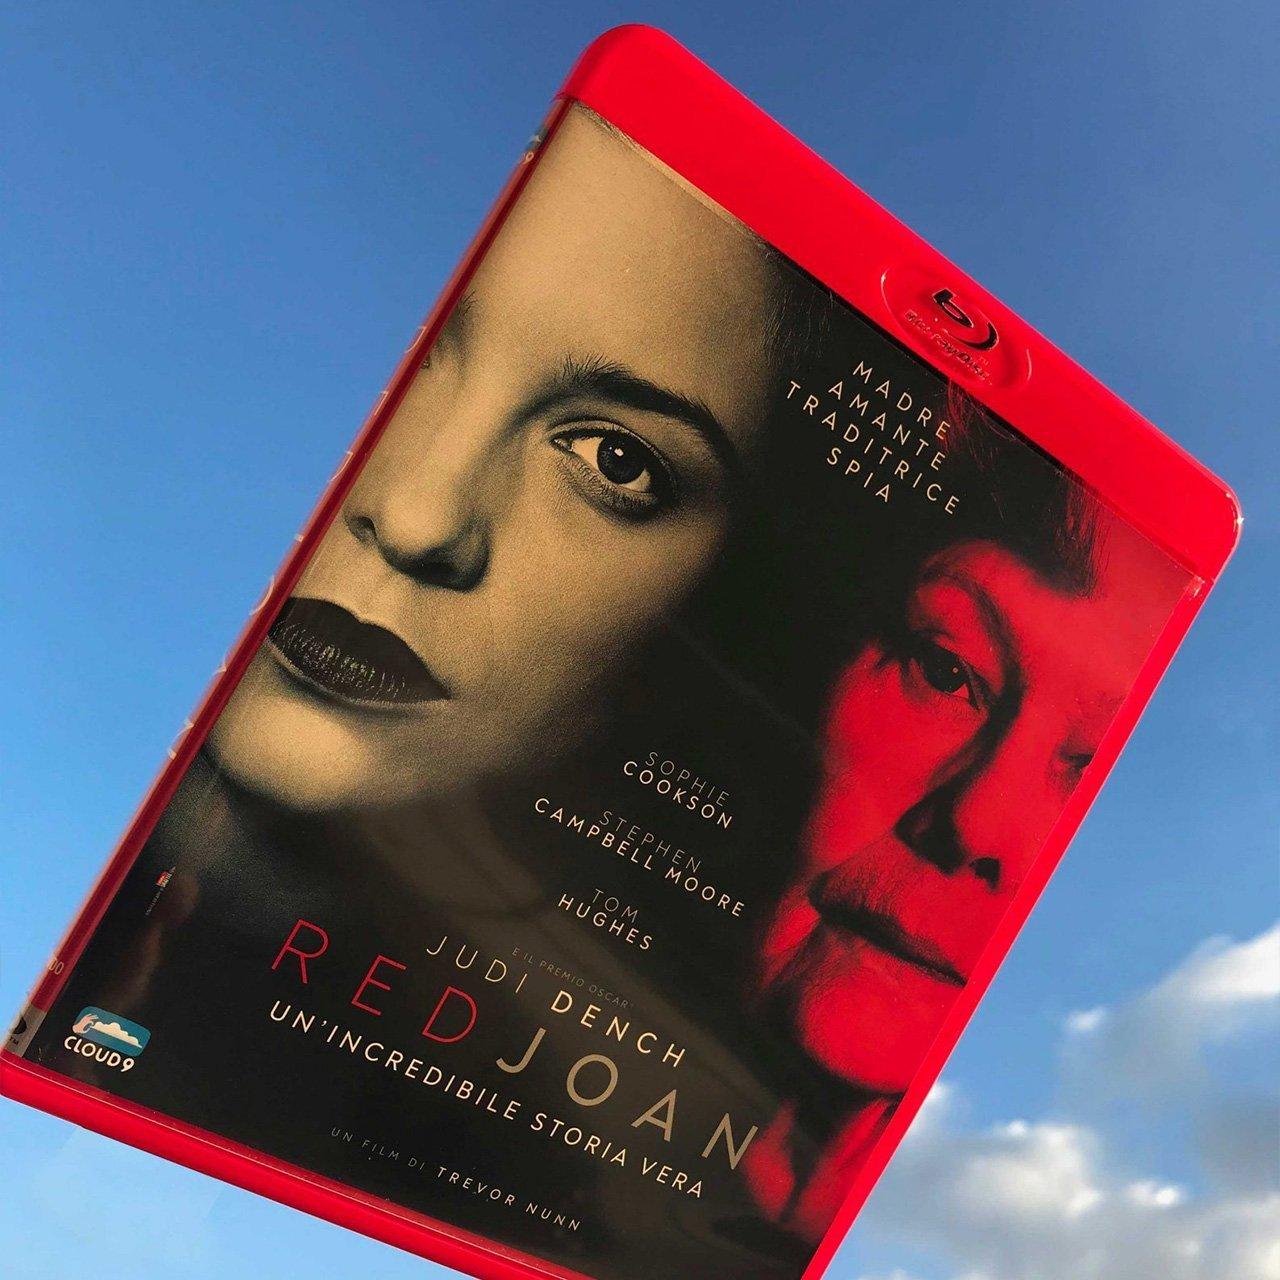 Red Joan disponibile in blu-ray